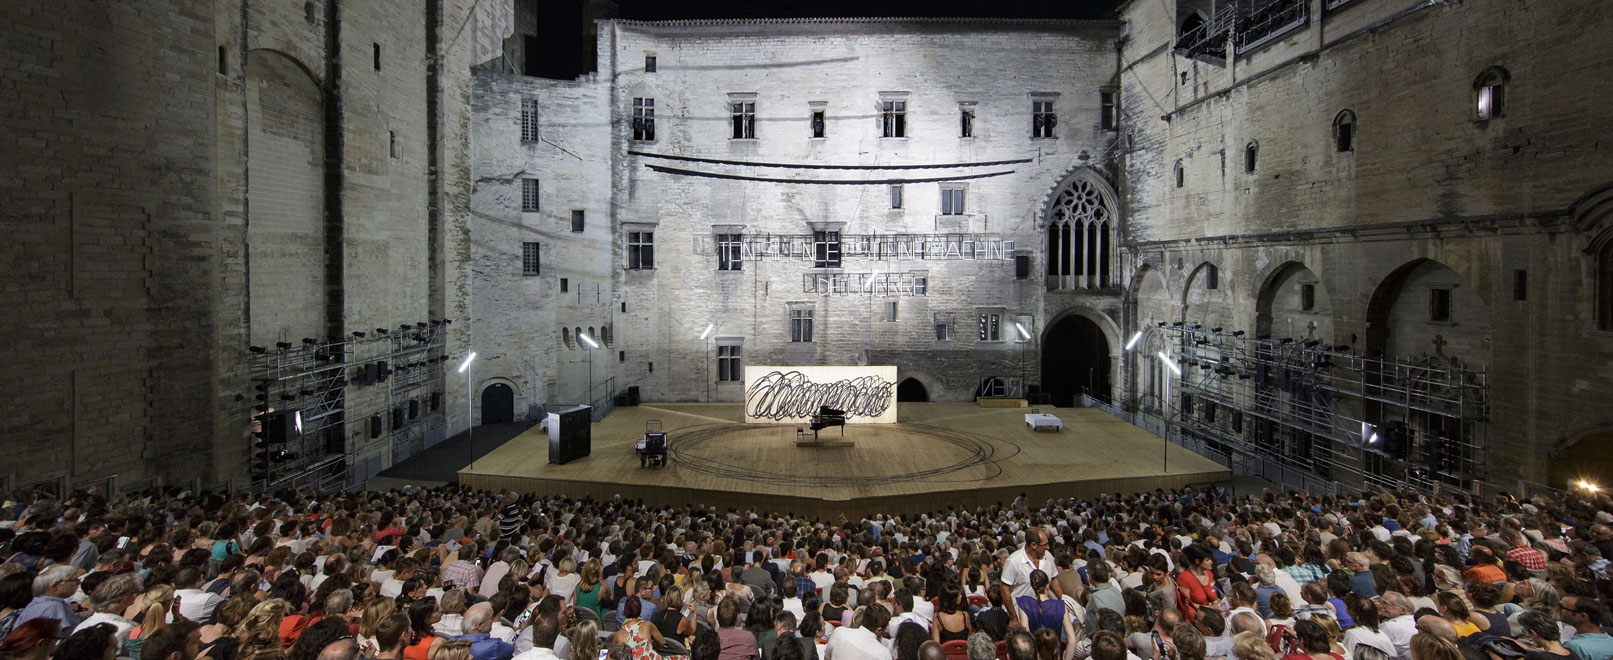 Festival d'Avignon © Raynaud de Lage